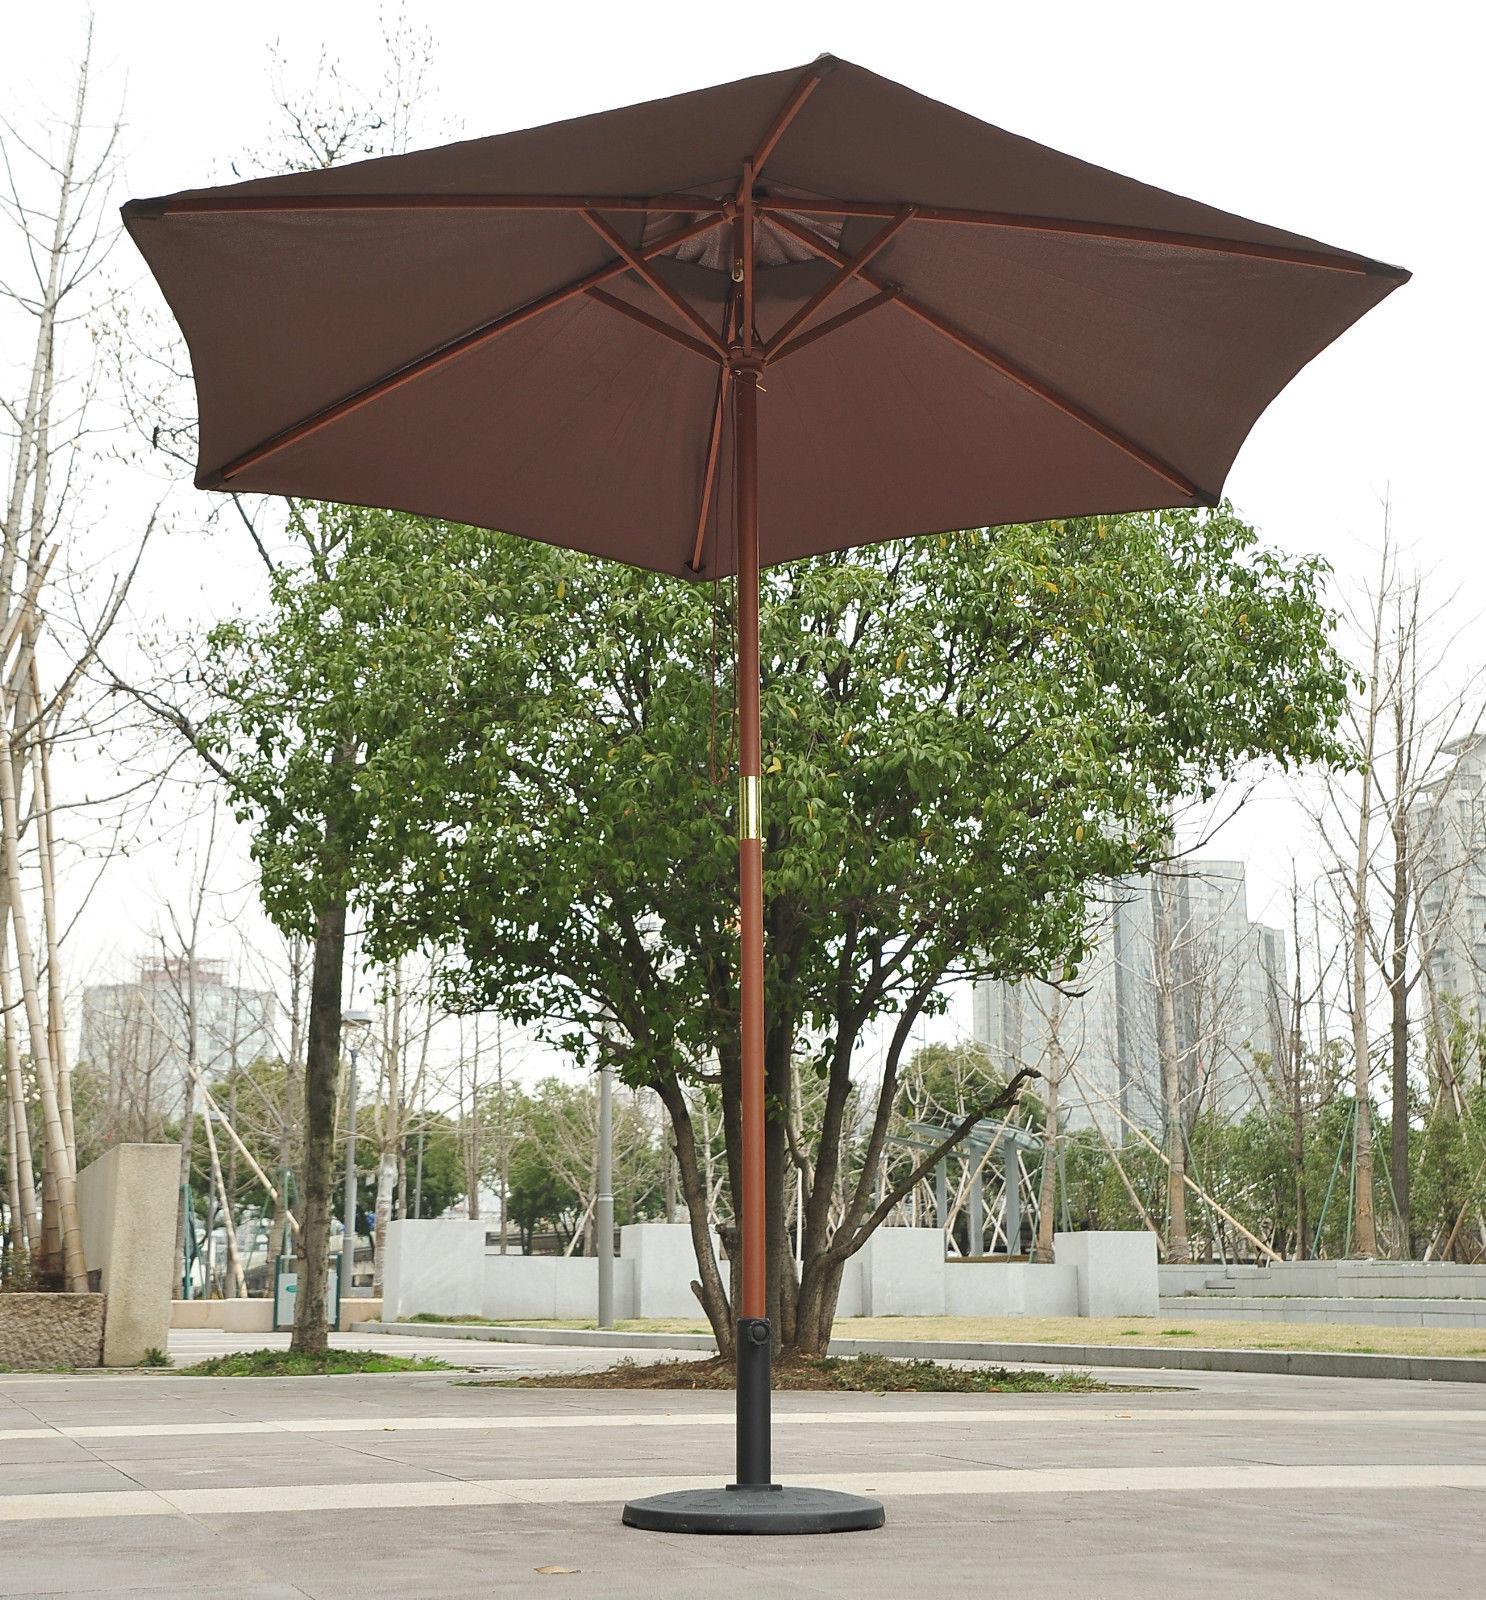 wood wooden garden parasol sun shade patio outdoor umbrella canopy new ebay. Black Bedroom Furniture Sets. Home Design Ideas